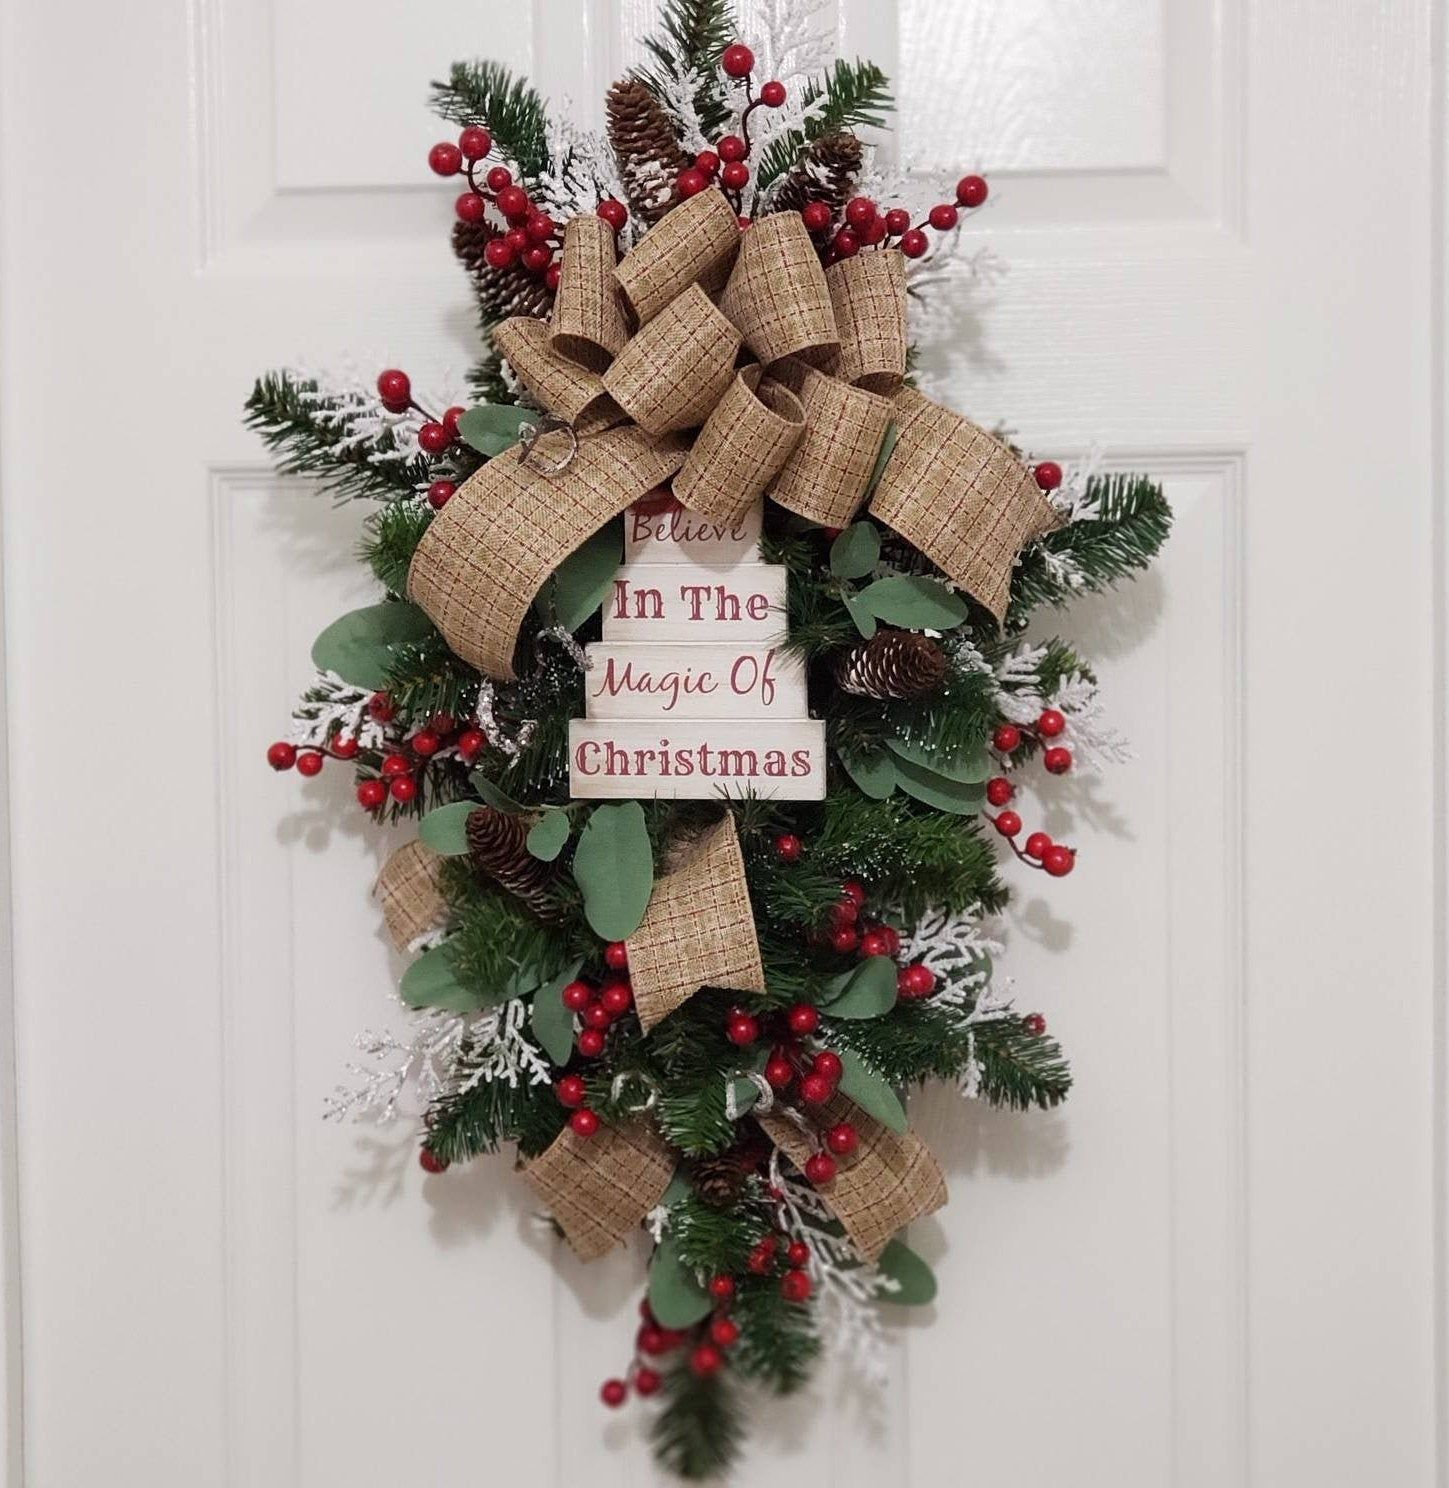 Country Christmas Swag Christmas Swag For Front Door Holiday Swag Christmas Swag Pine Cone Swag Rustic Ch Christmas Decorations Christmas Wreaths Holiday Decor